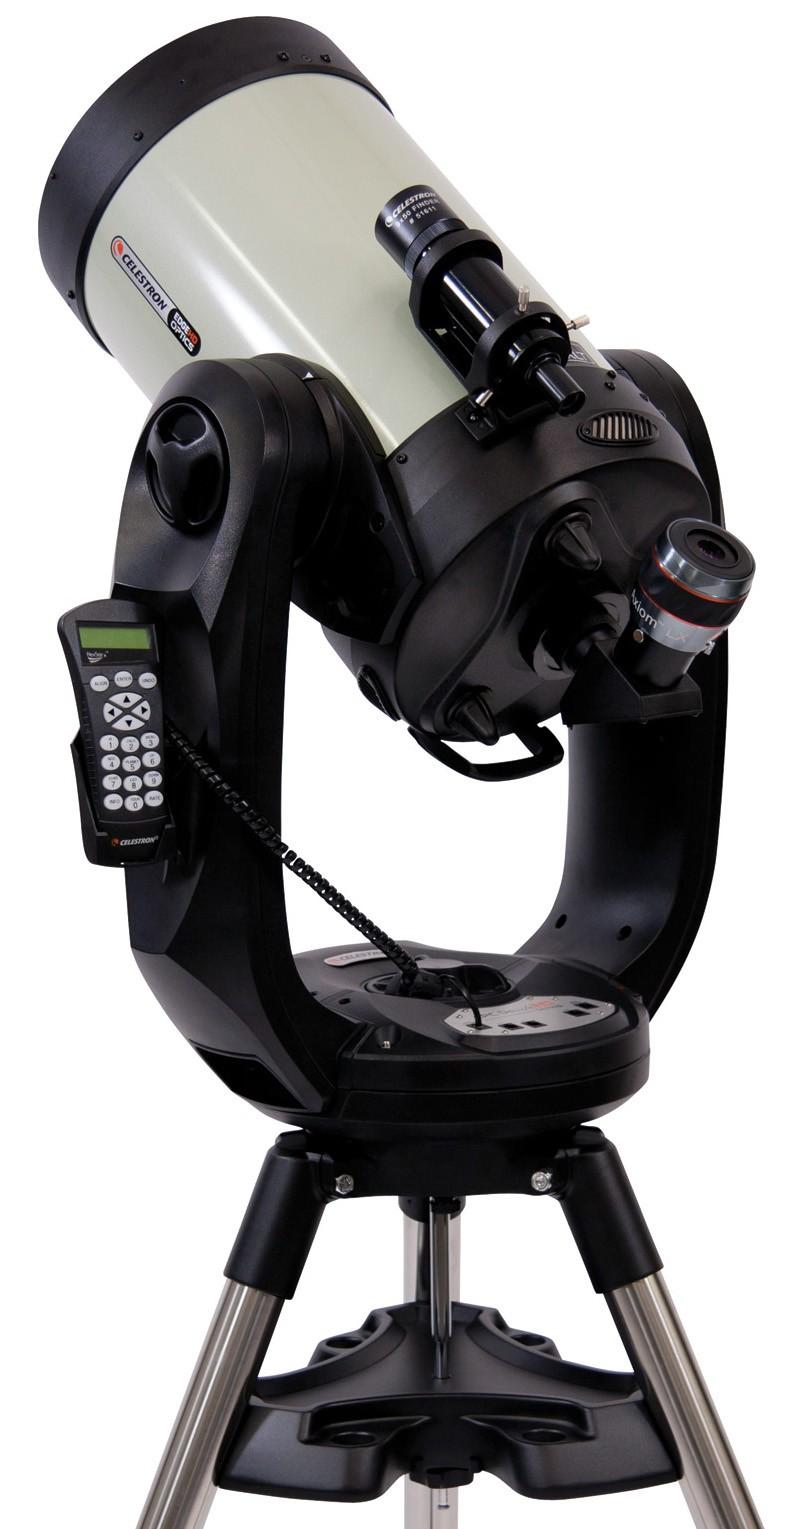 Celestron CPC Deluxe 1100 HD Computerised Telescope